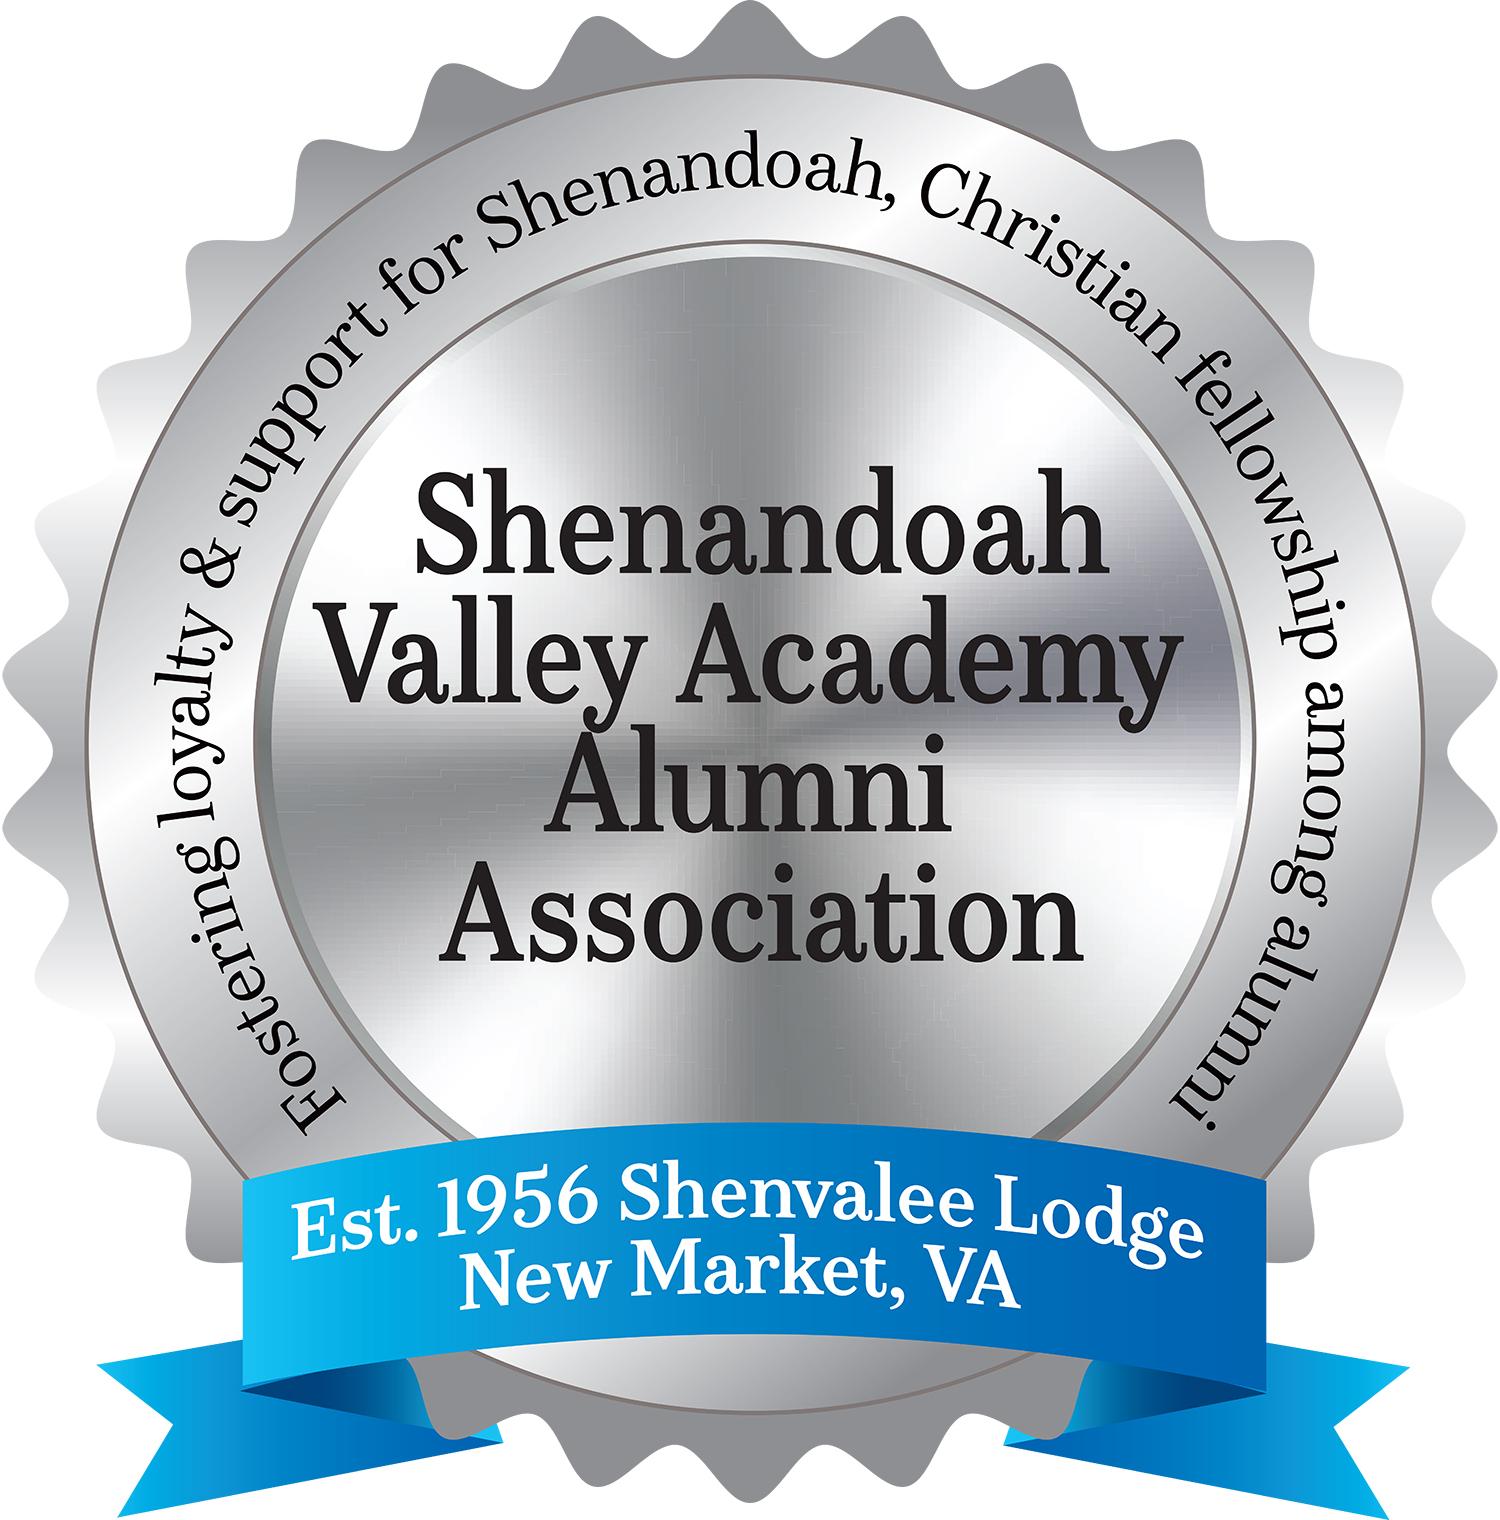 SVA Alumni Association - Shenandoah Valley Academy